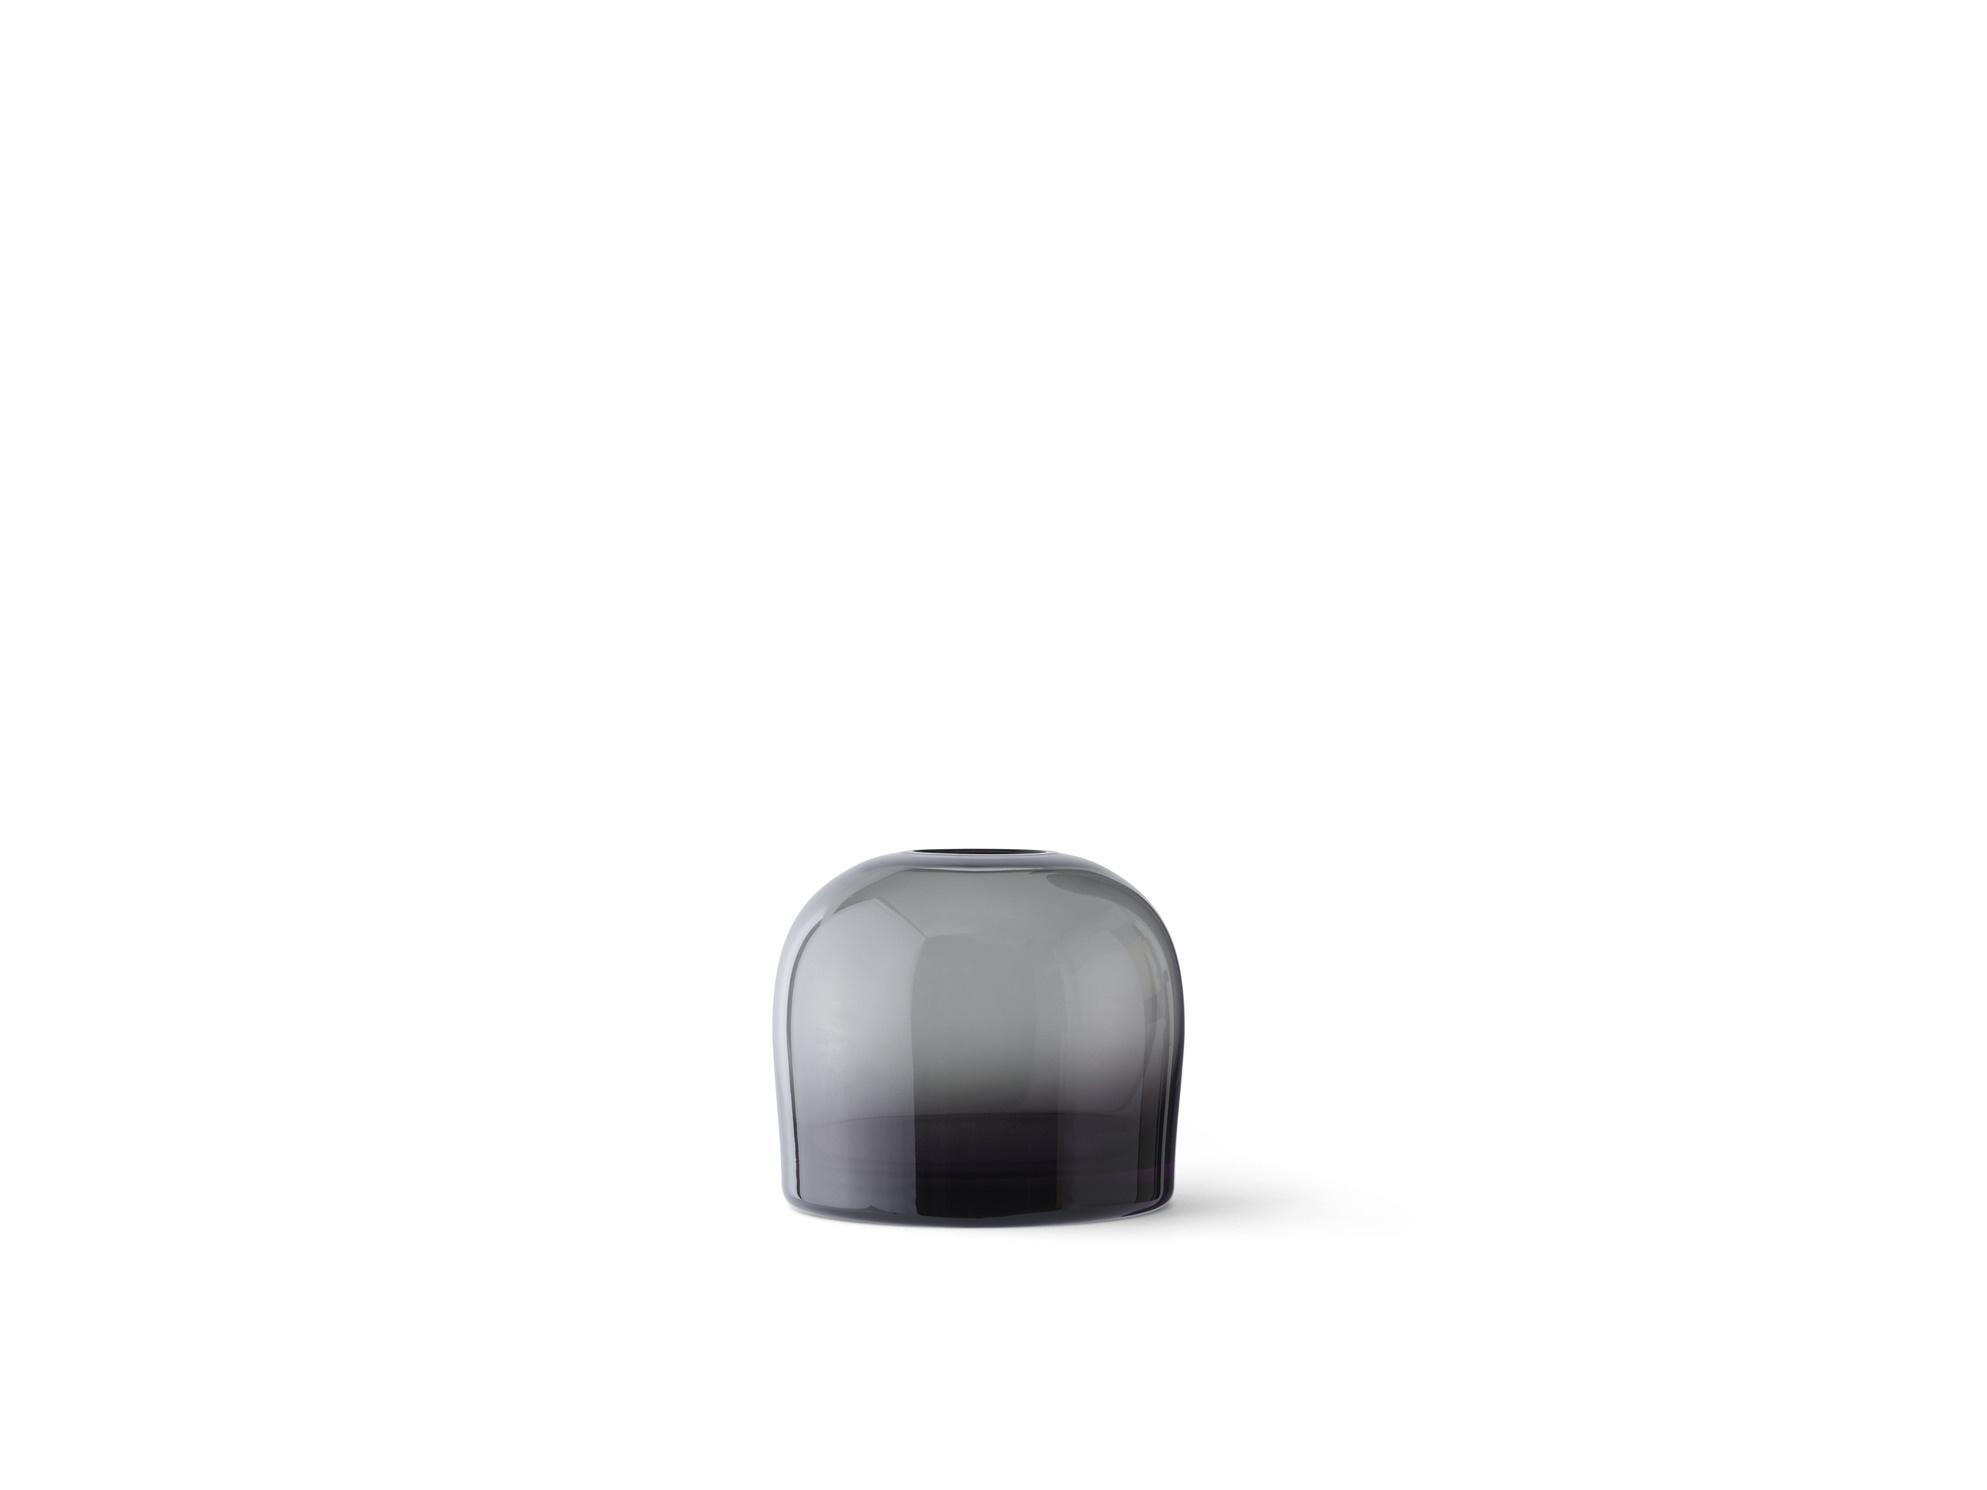 Troll Vase - Medium-2